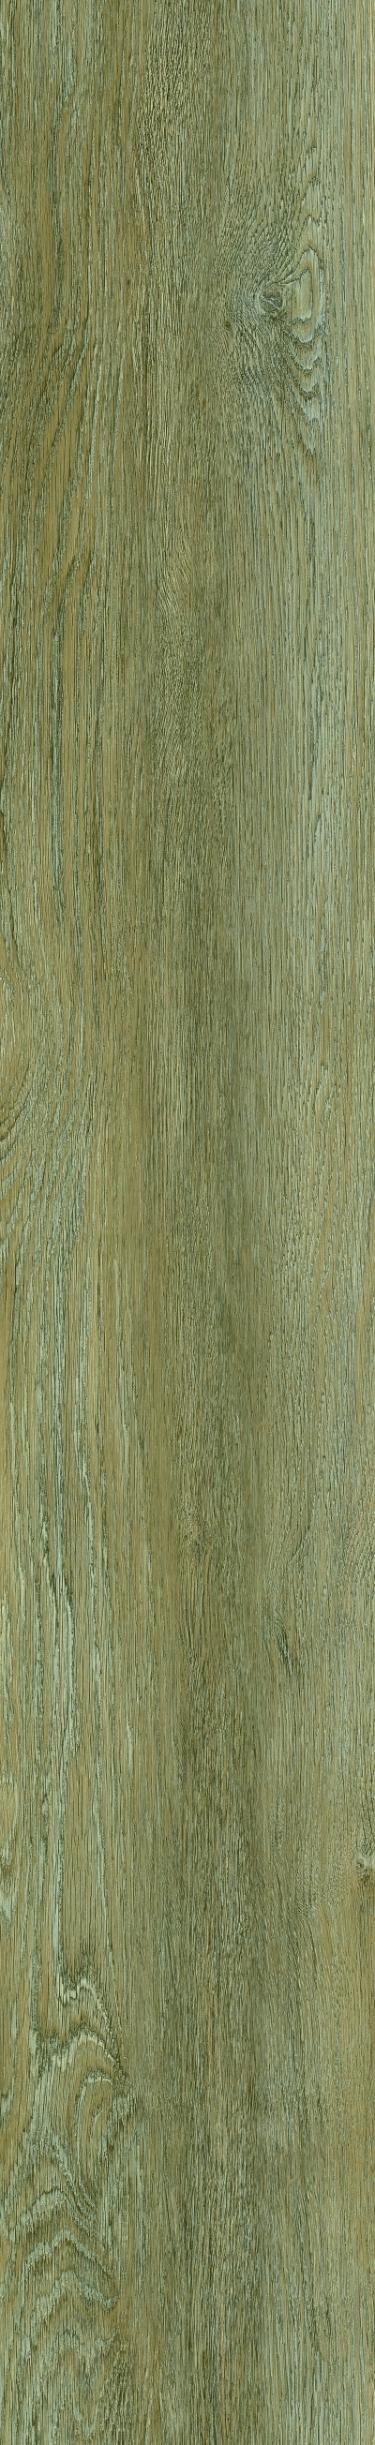 Vinylové podlahy Gerflor DESIGNART Traffic Rigid Jive Blond